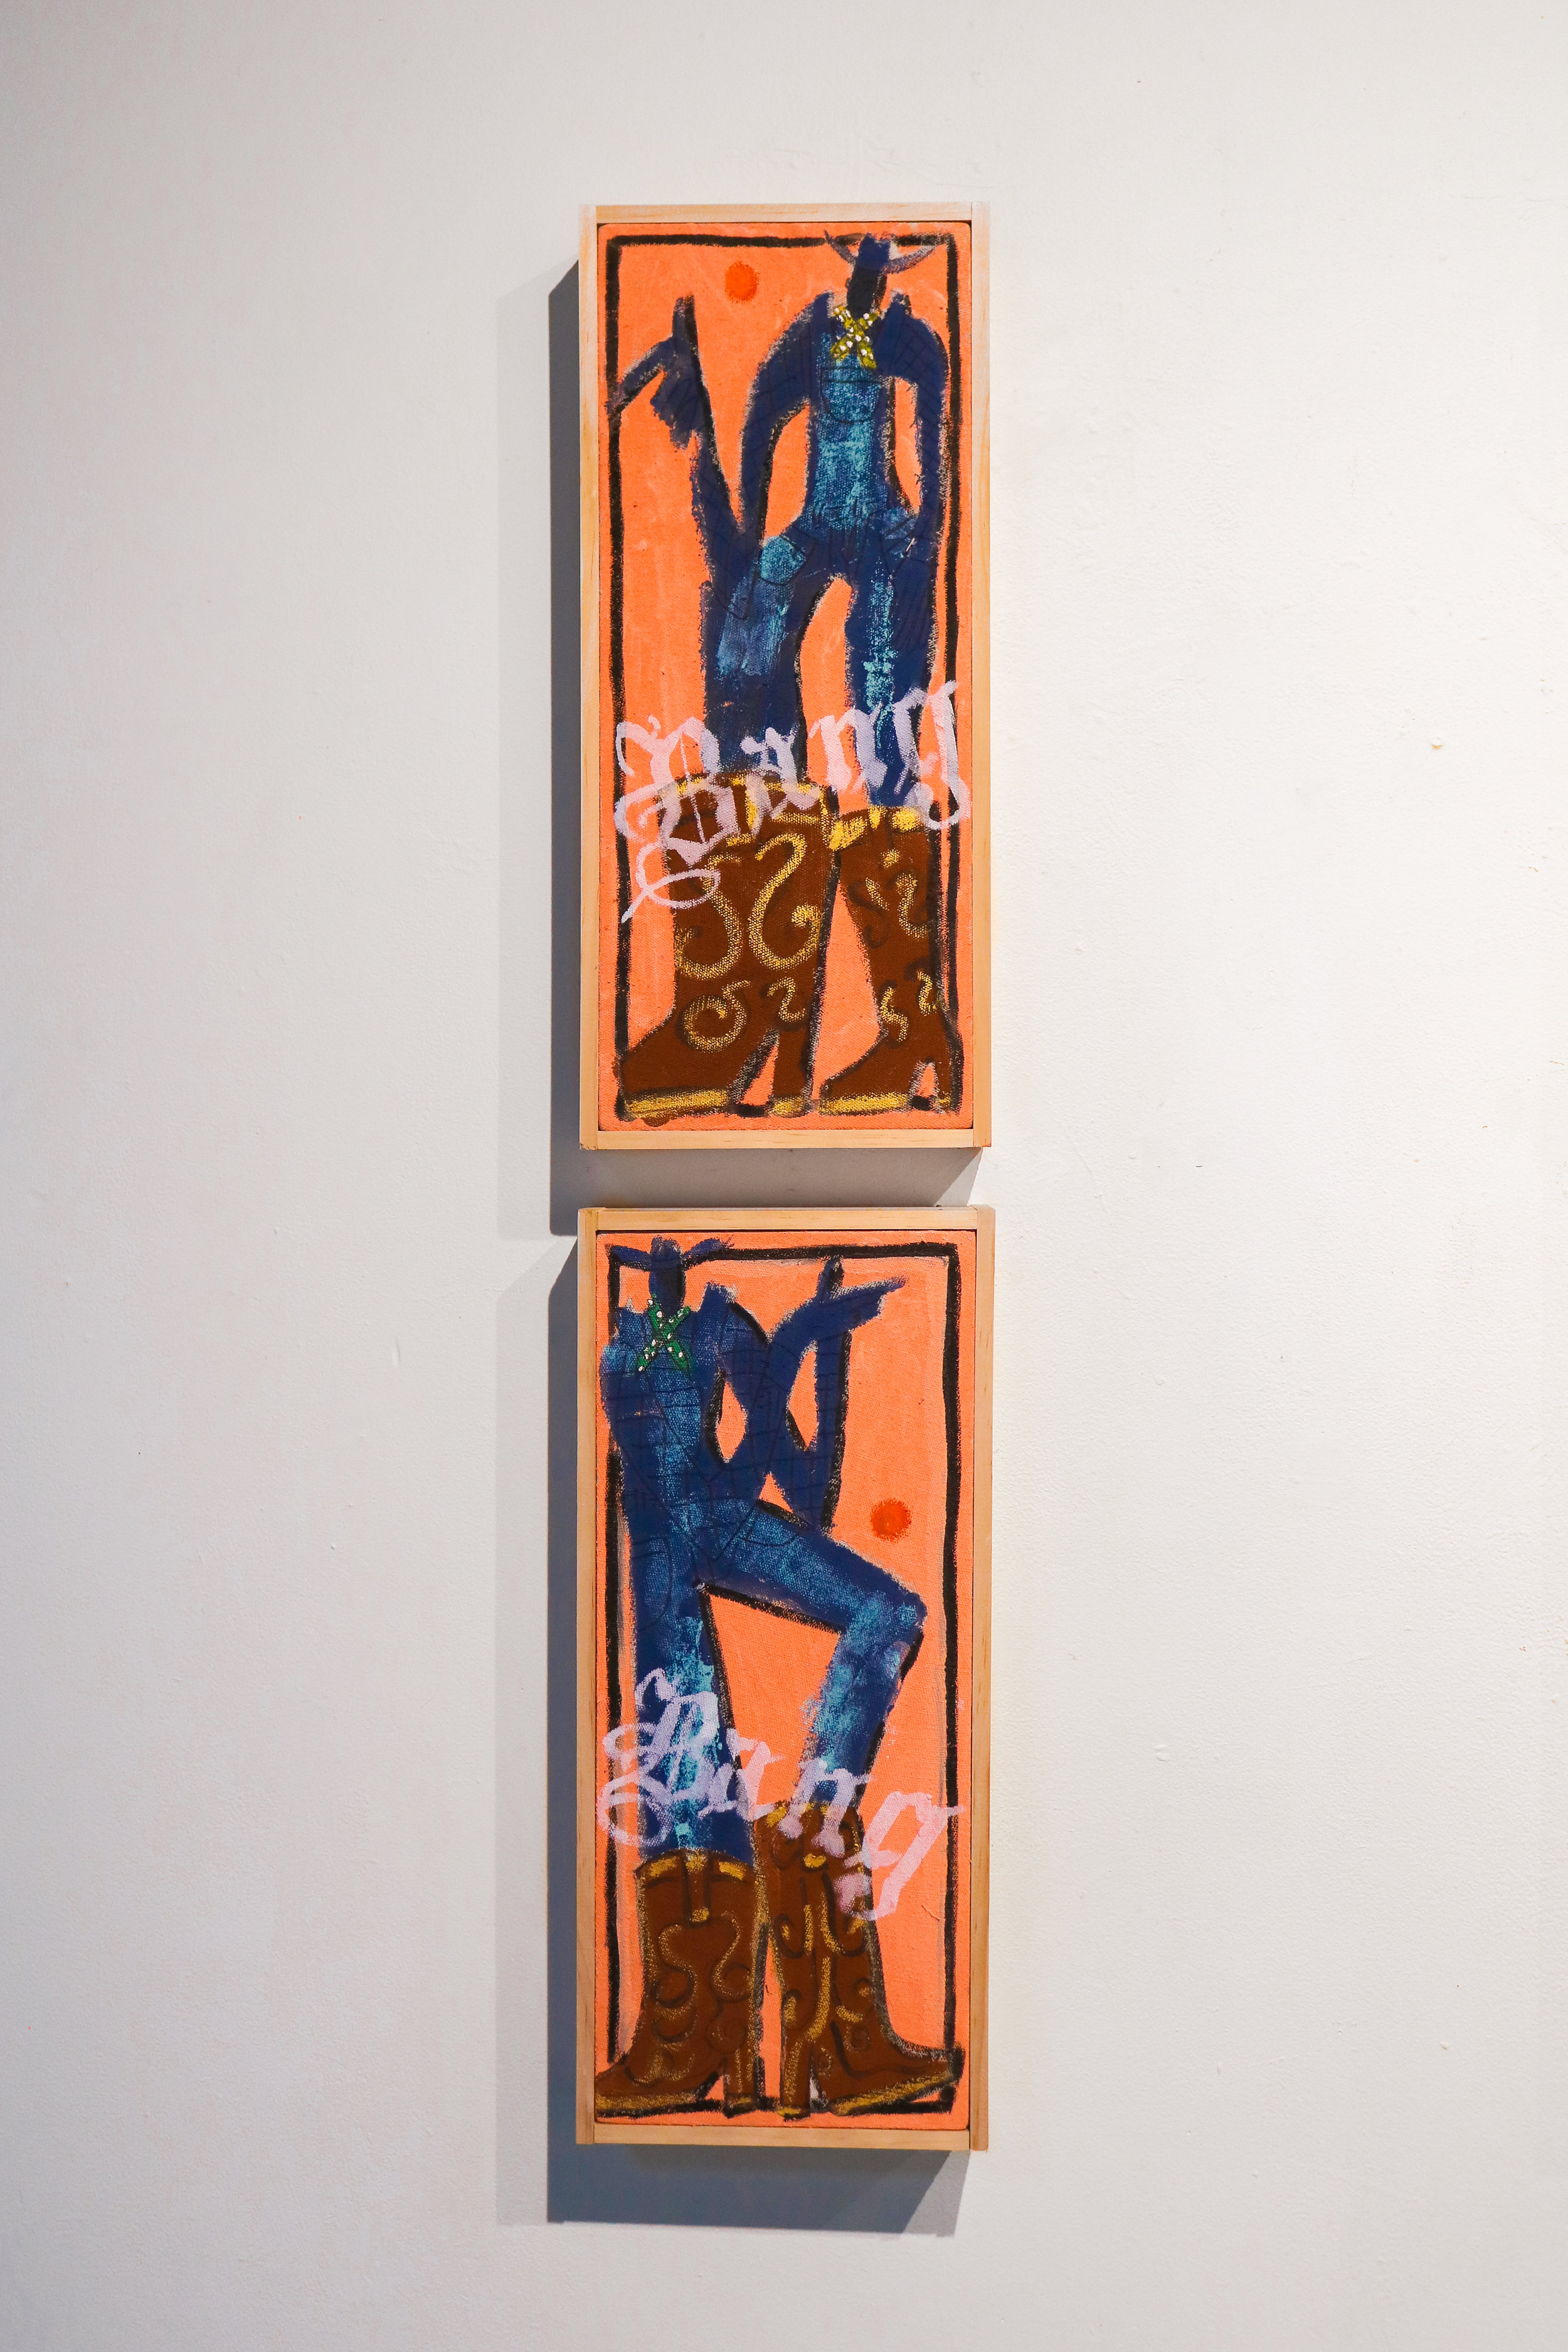 """Mini quickdraw (1&2)"" - 8 x 17""8 x 17""Acrylic, Oil & Ink on Canvas"